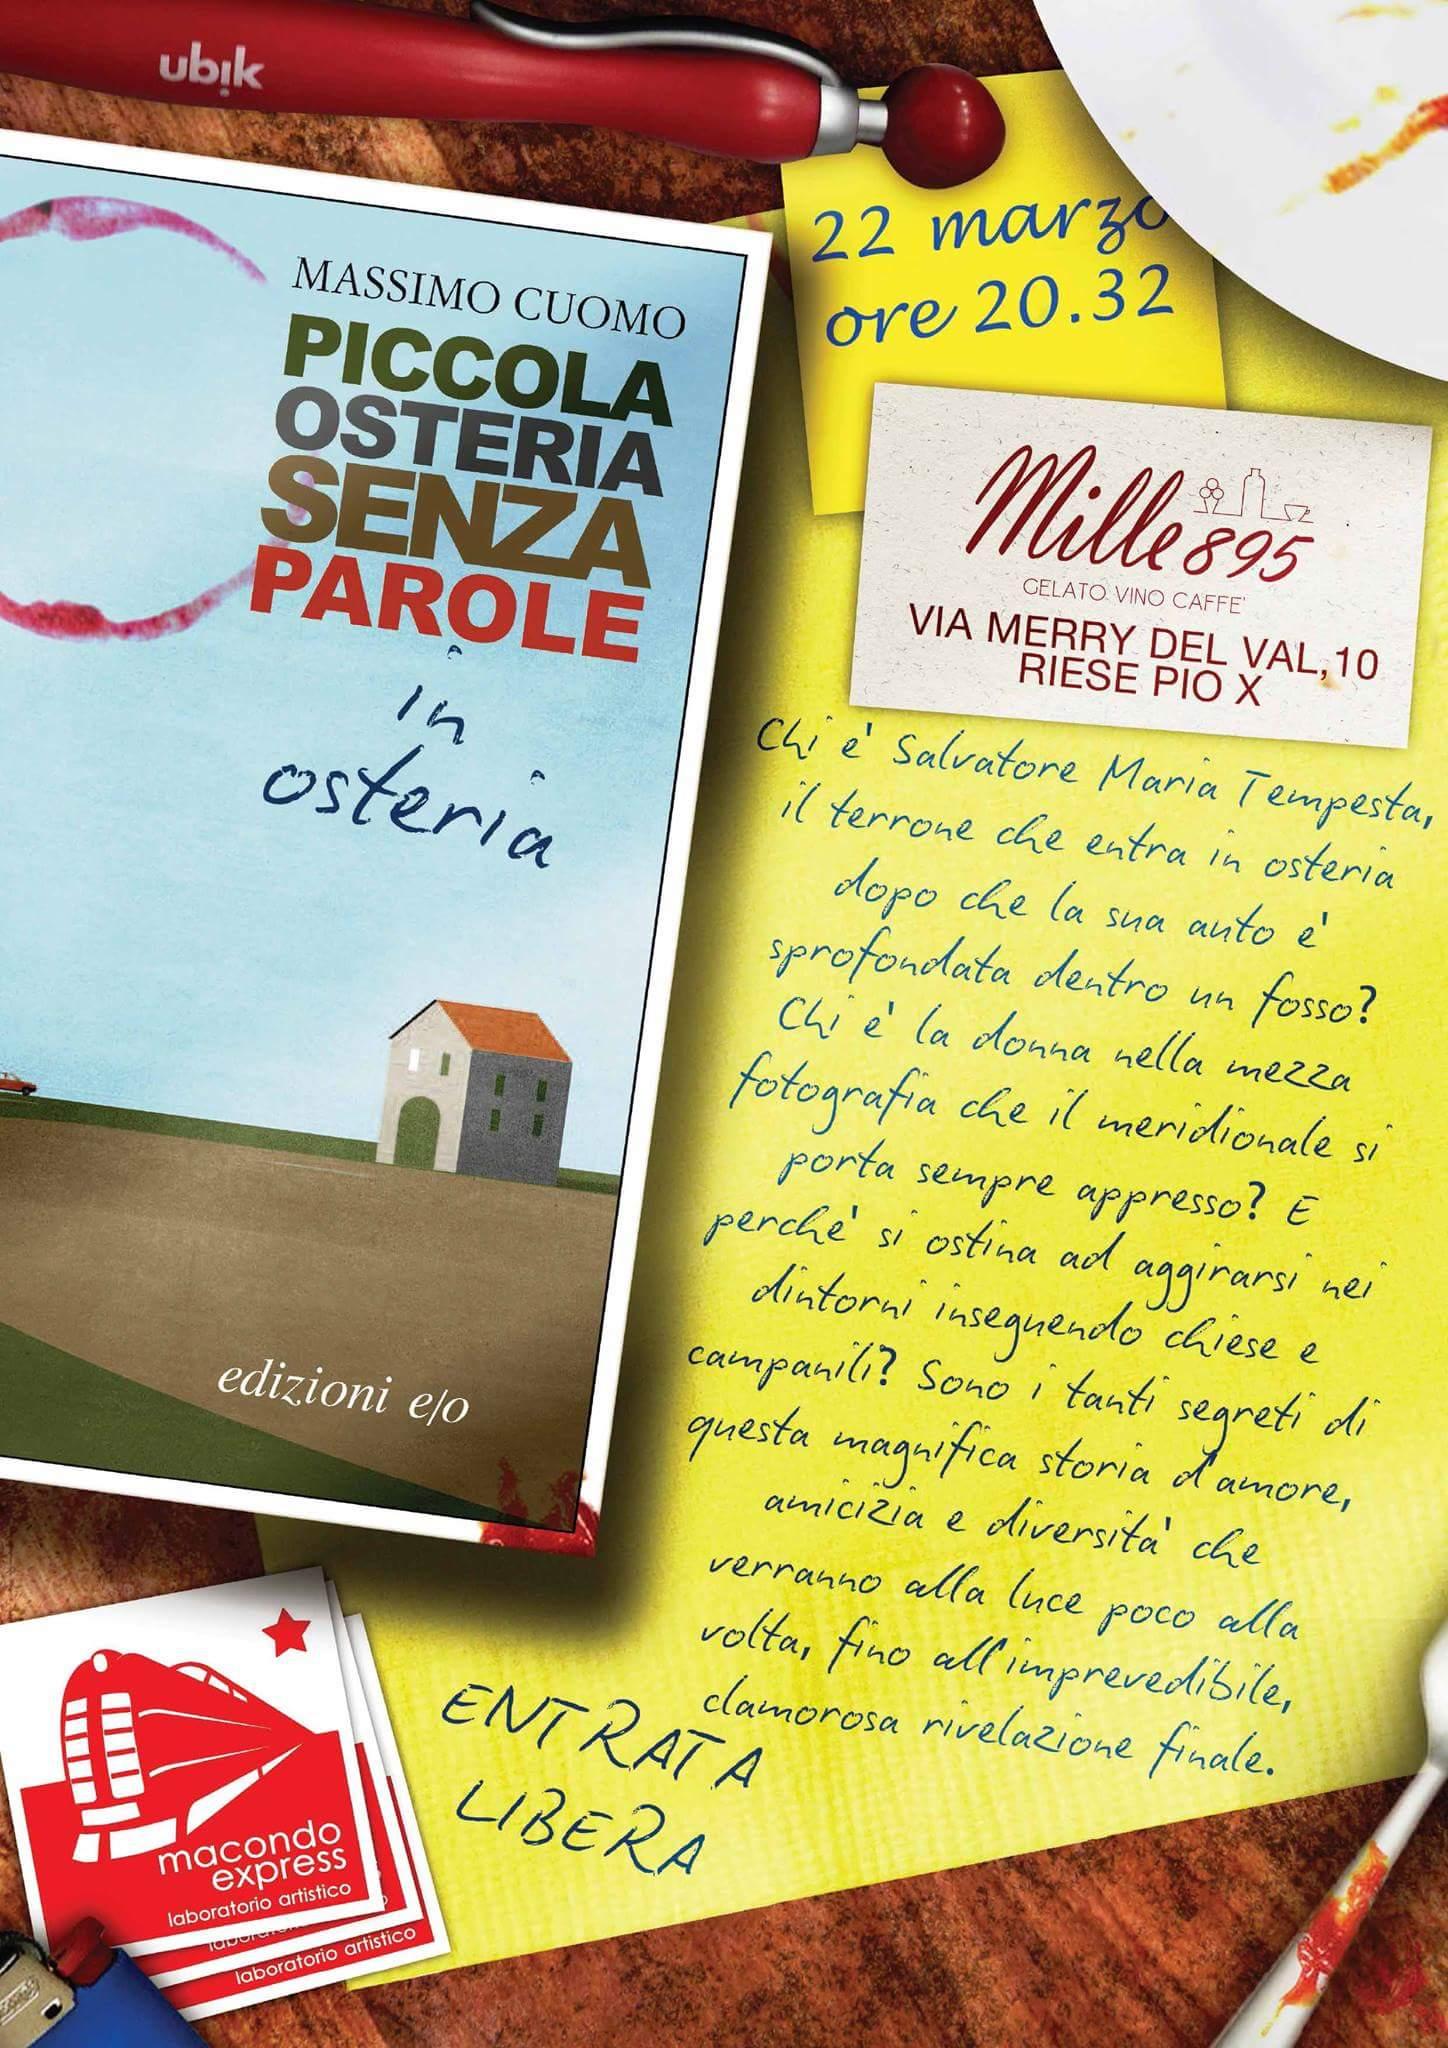 Piccola Osteria senza Parole in Osteria. A Castelfranco, Osteria Mille895.